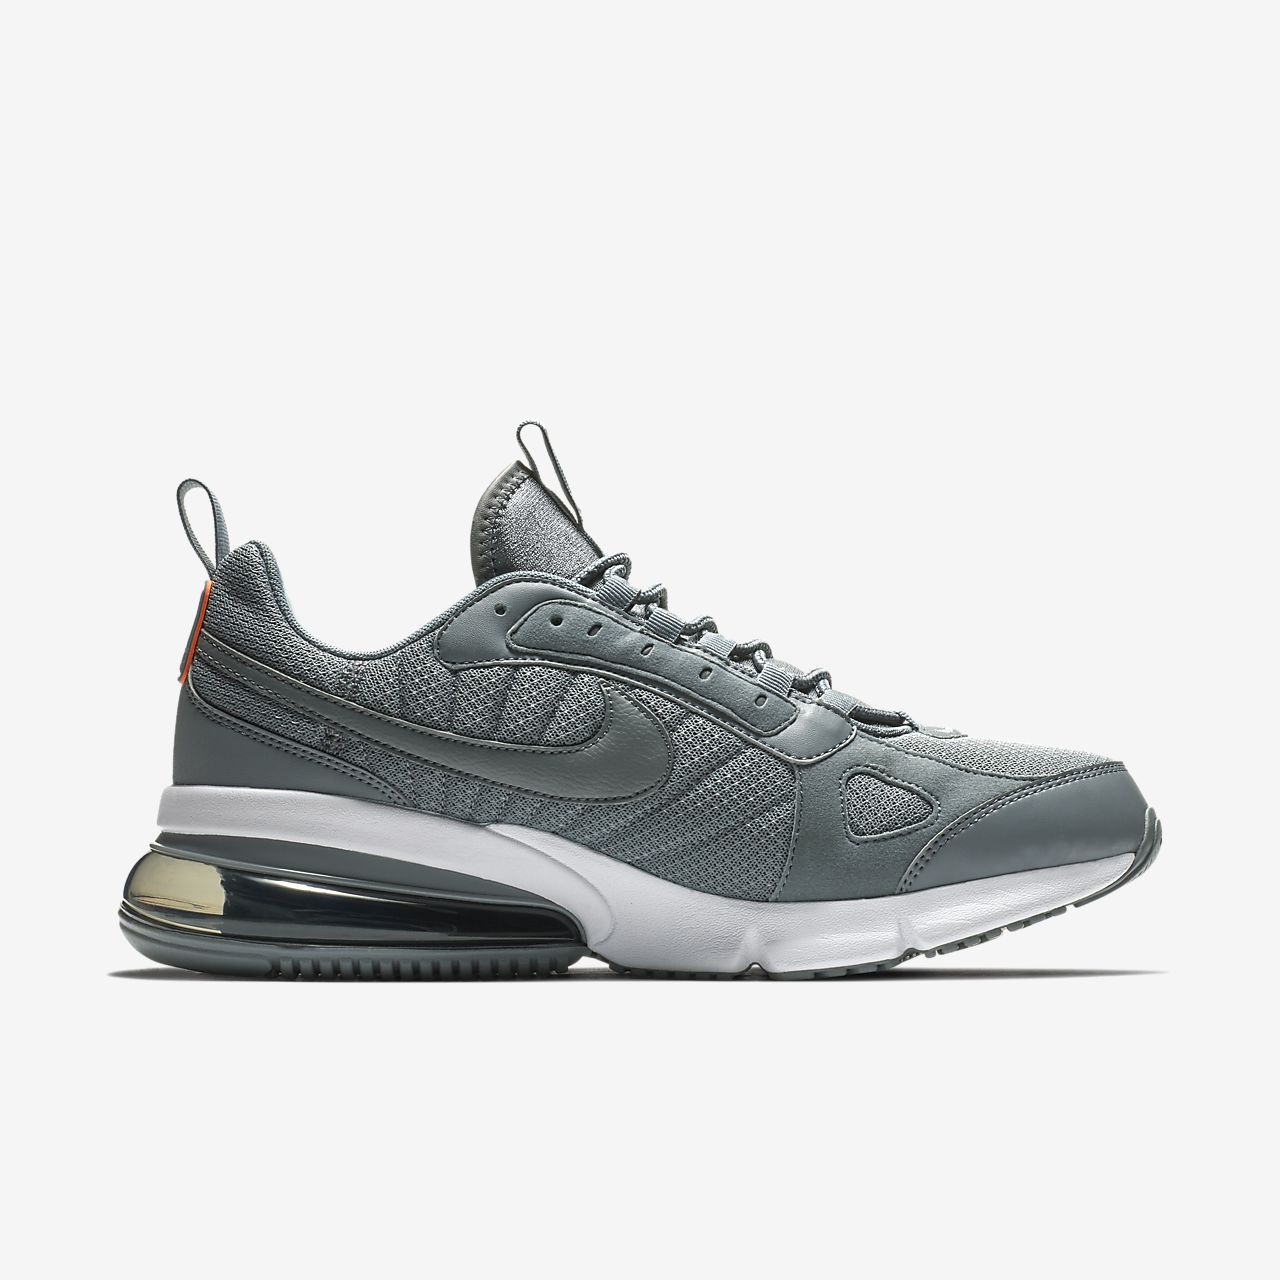 7d9f4570296827 Nike Air Max 270 Futura Men s Shoe. Nike.com LU